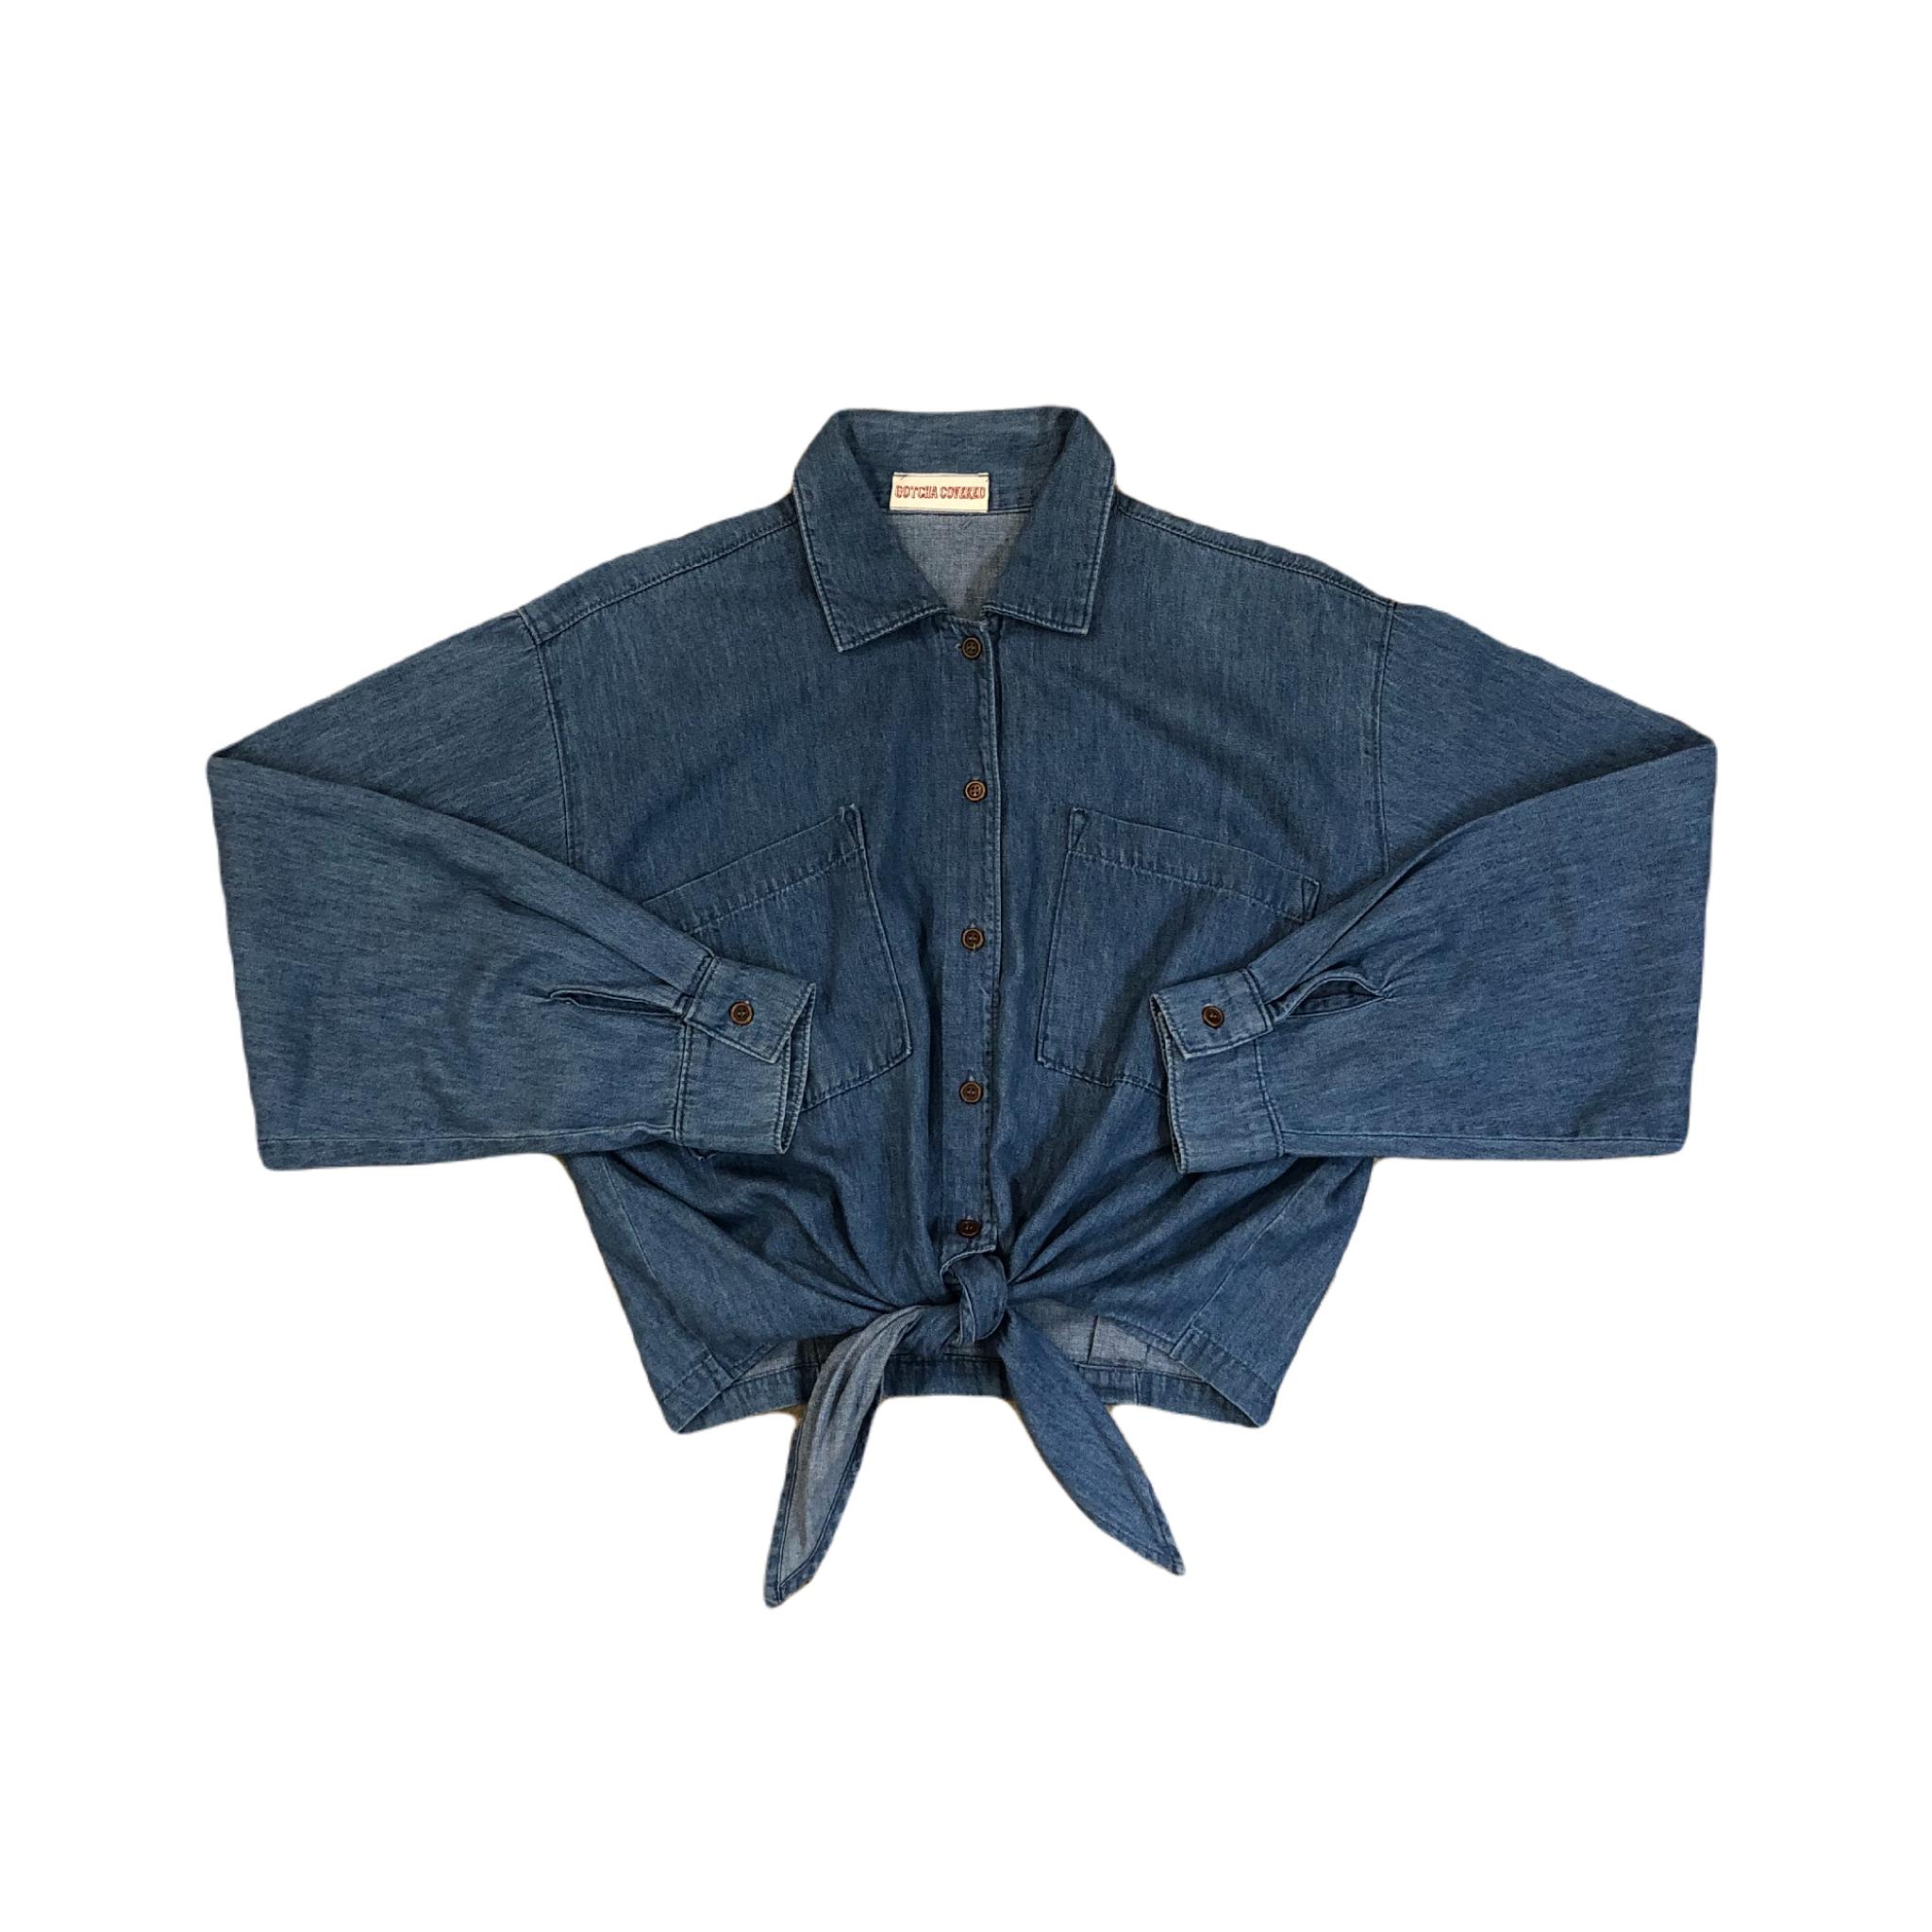 Gotcha Covered Denim Shirts ¥5,400+tax